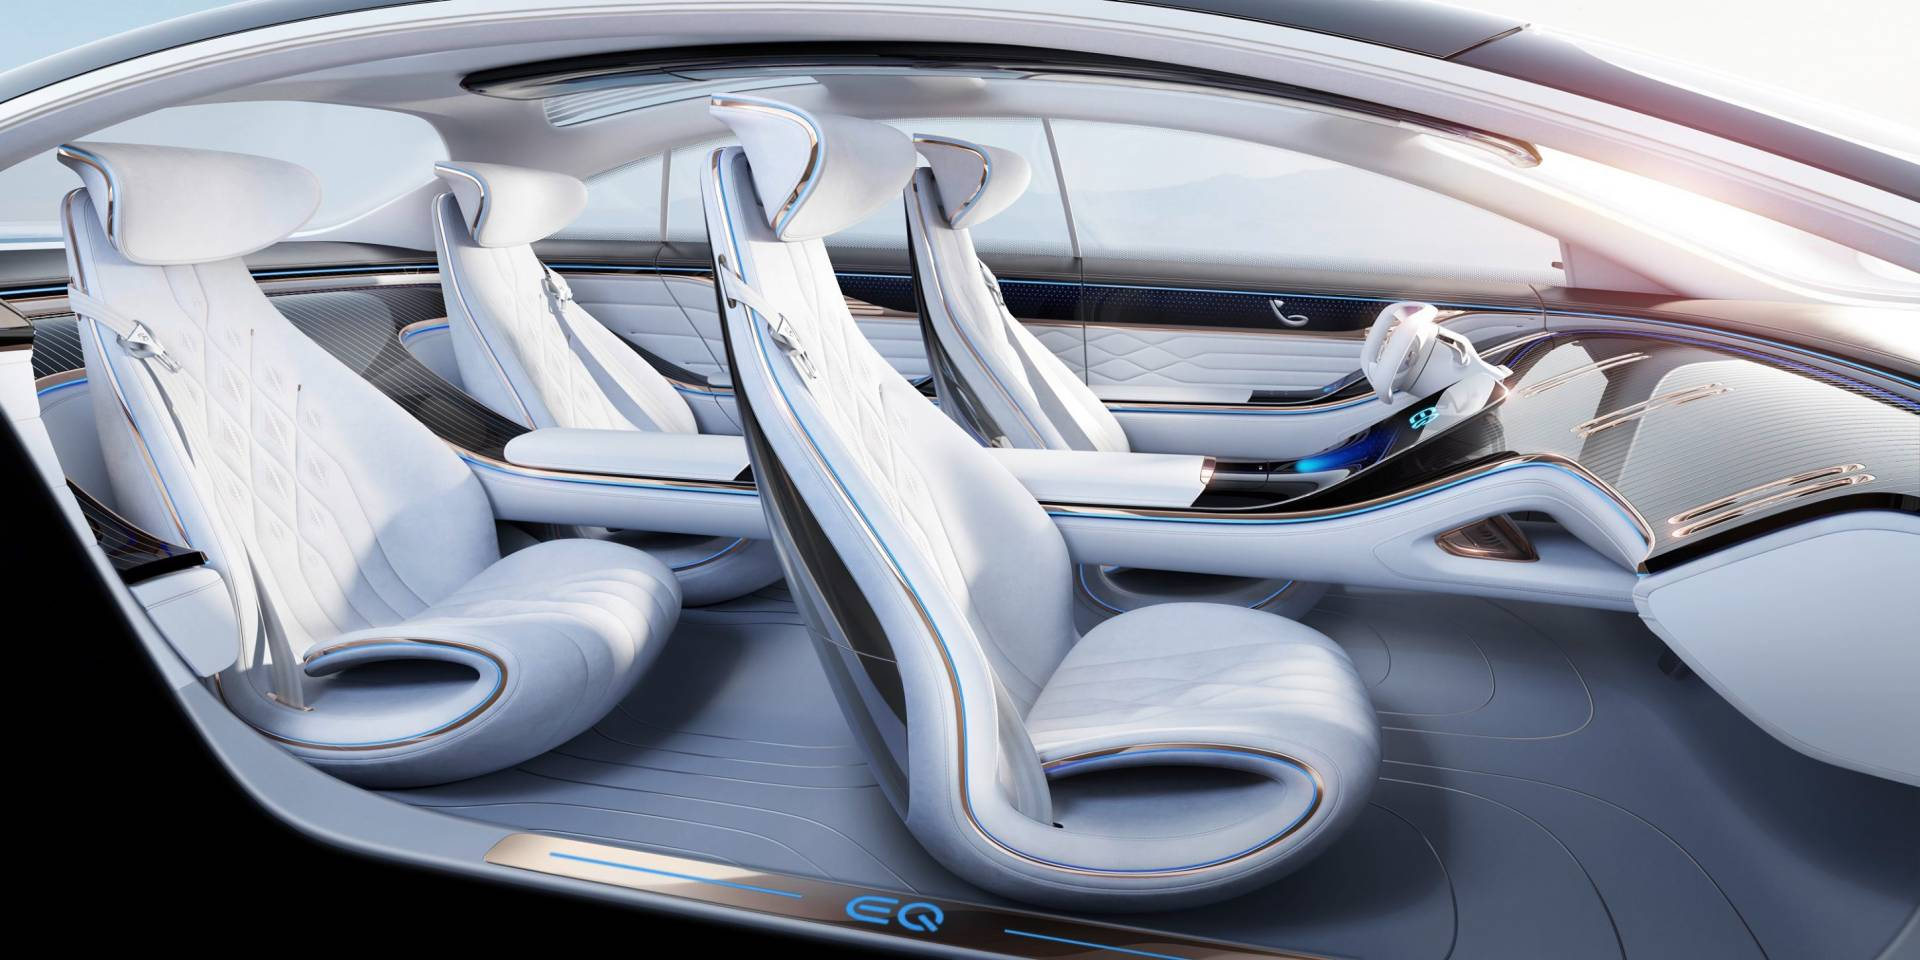 mercedes-benz-eq-concept-interior-teased-1.jpg